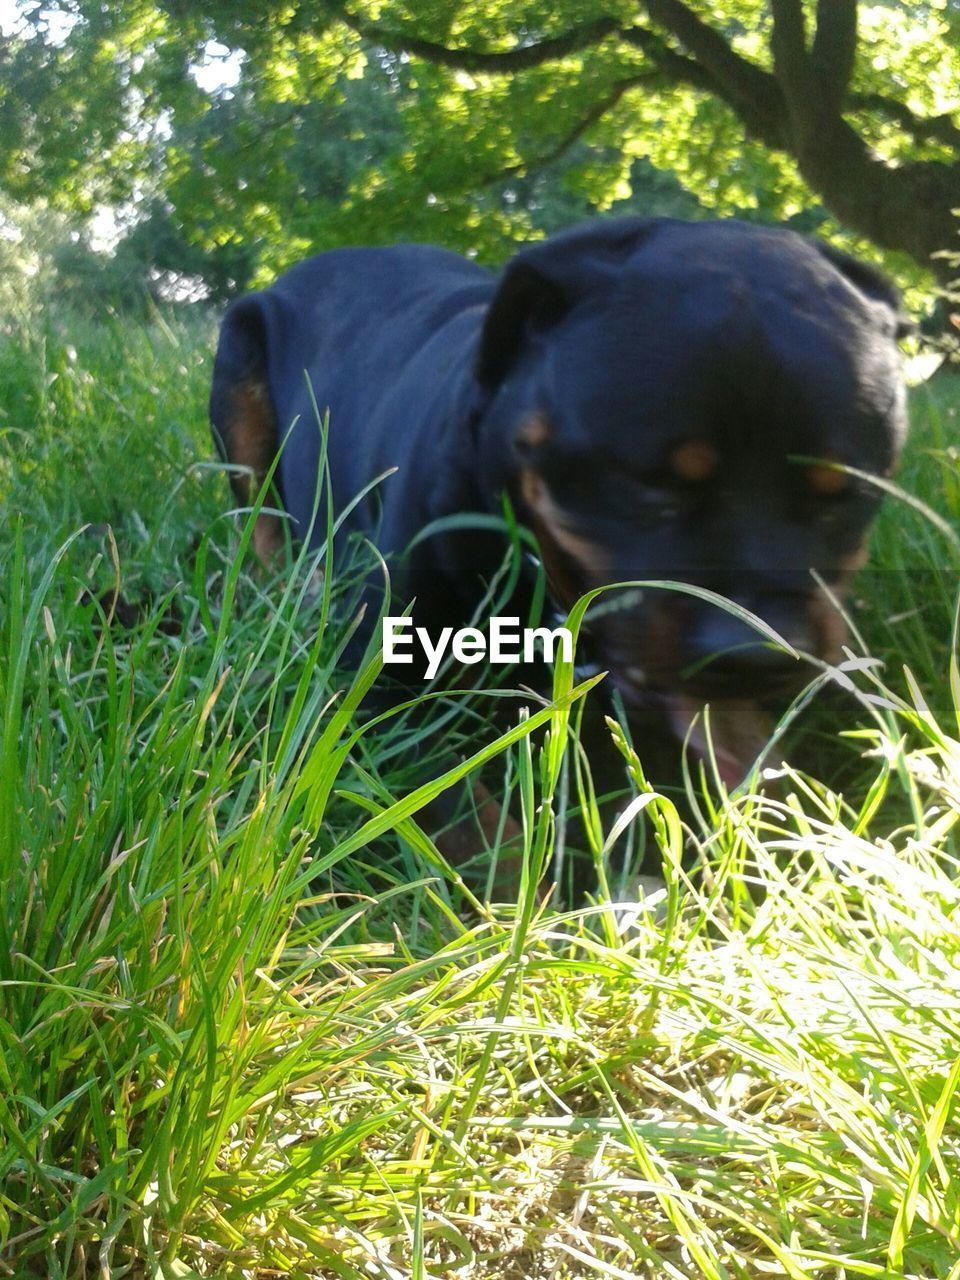 Rottweiler relaxing on grassy field